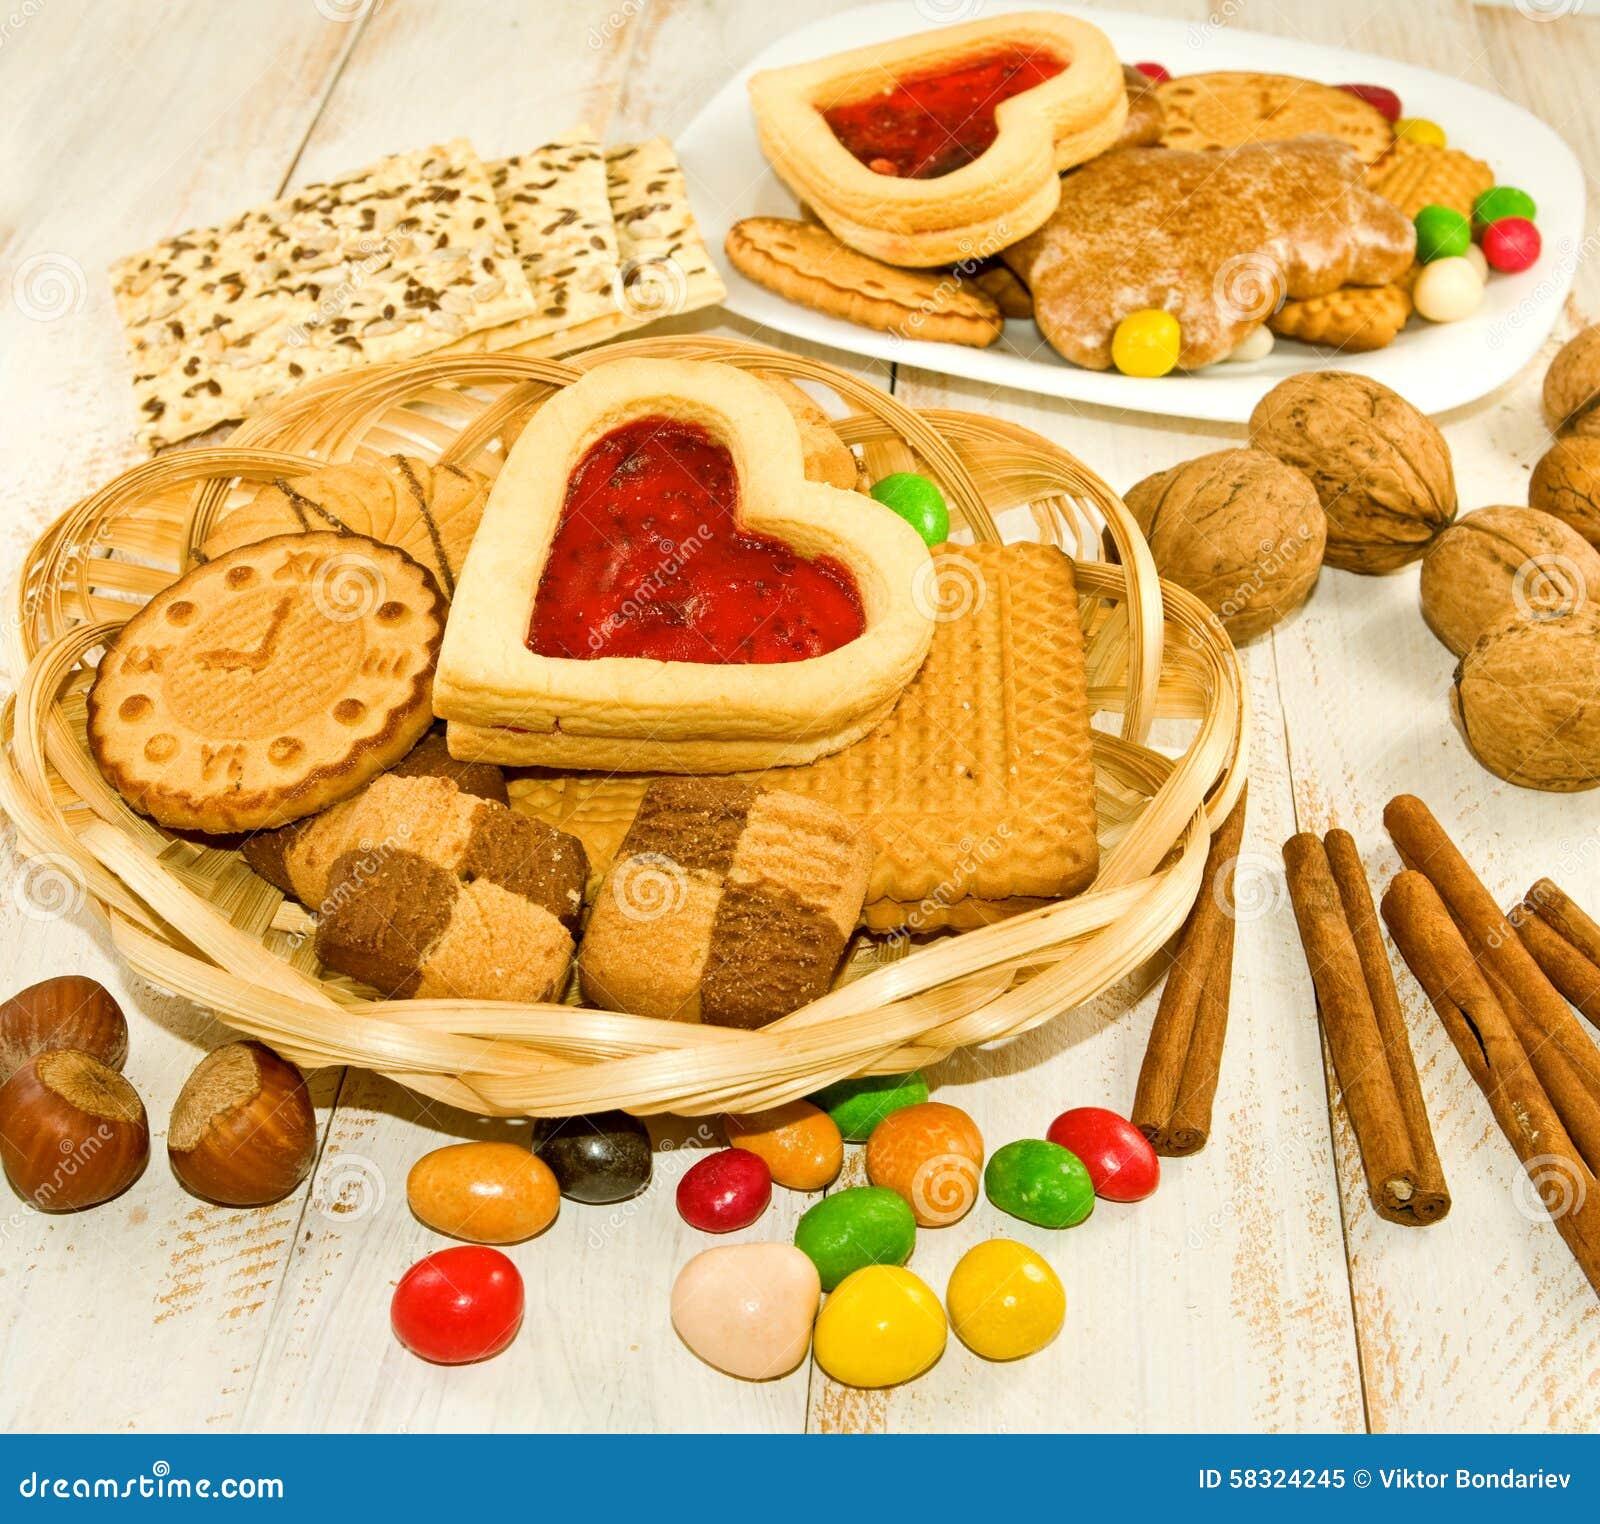 Image de beaucoup de biscuits